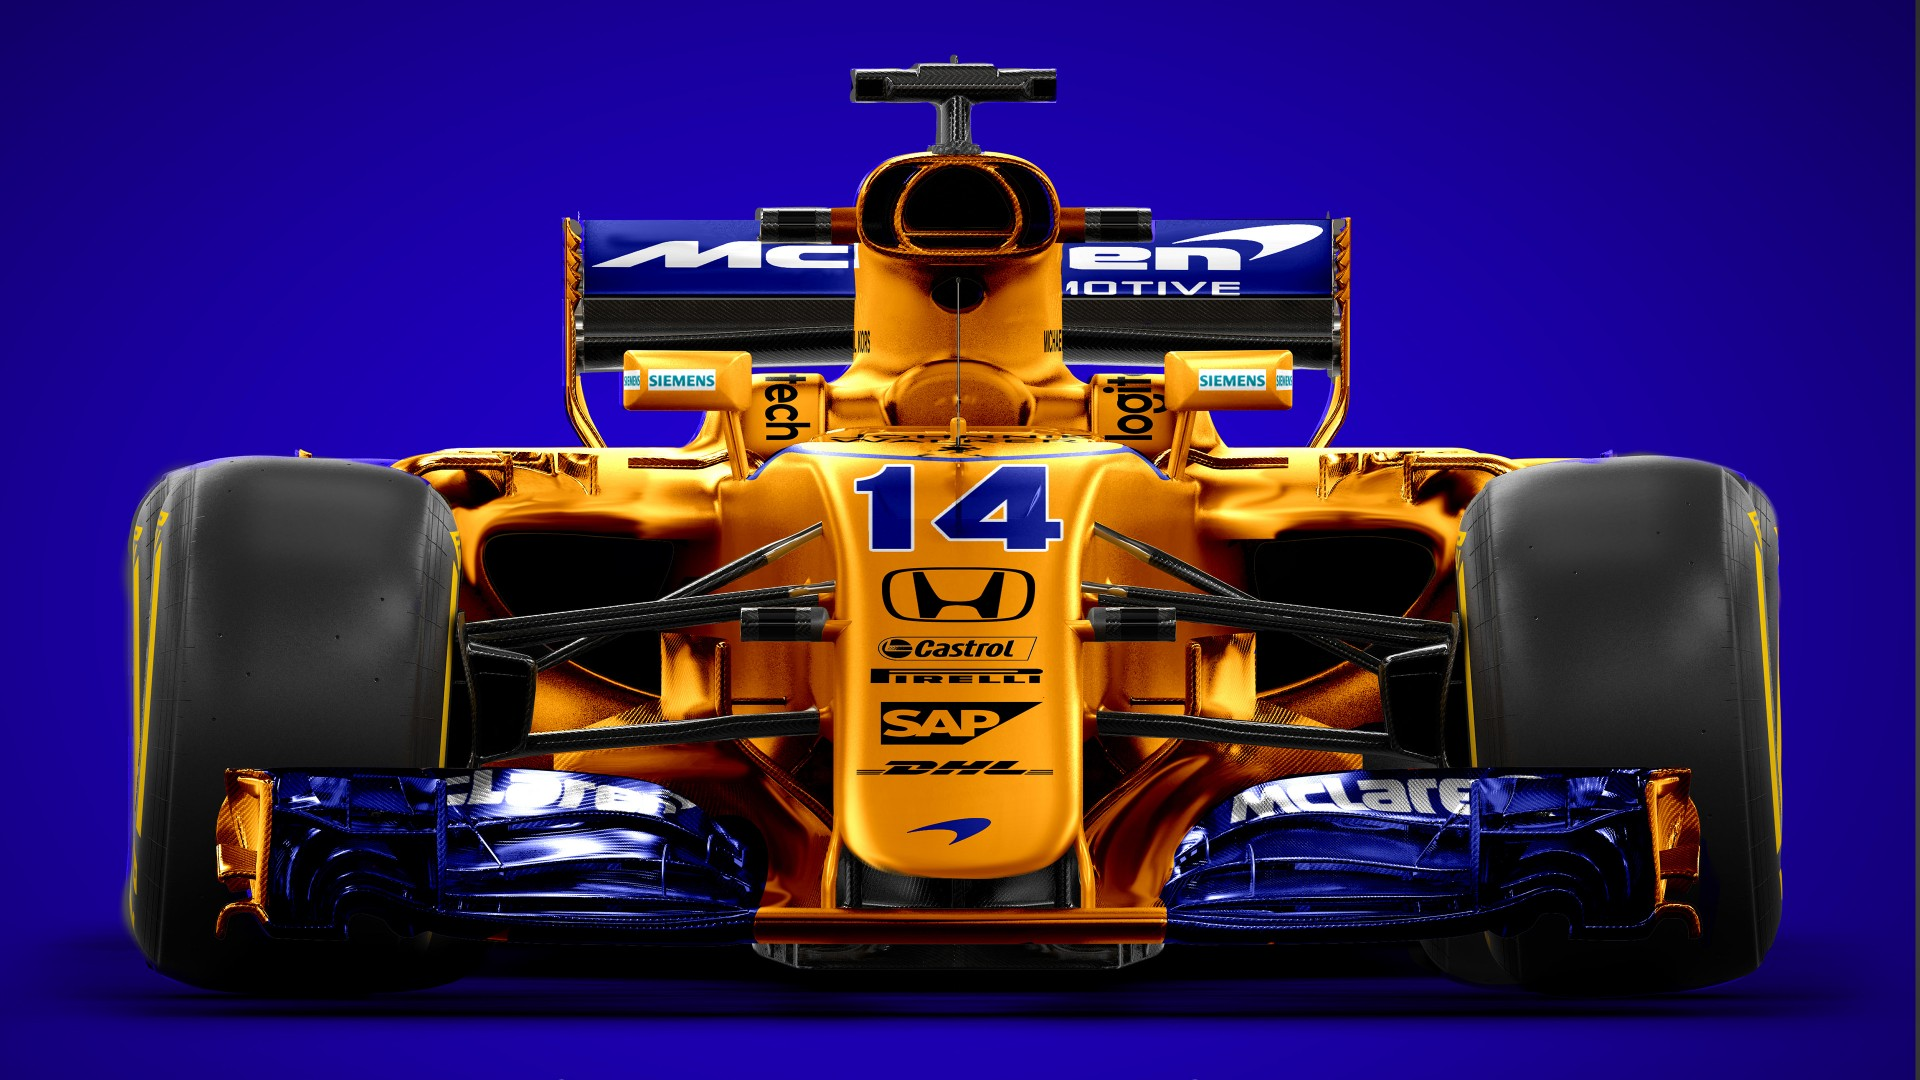 Mclaren F1 4K Wallpaper | HD Car Wallpapers | ID #8072